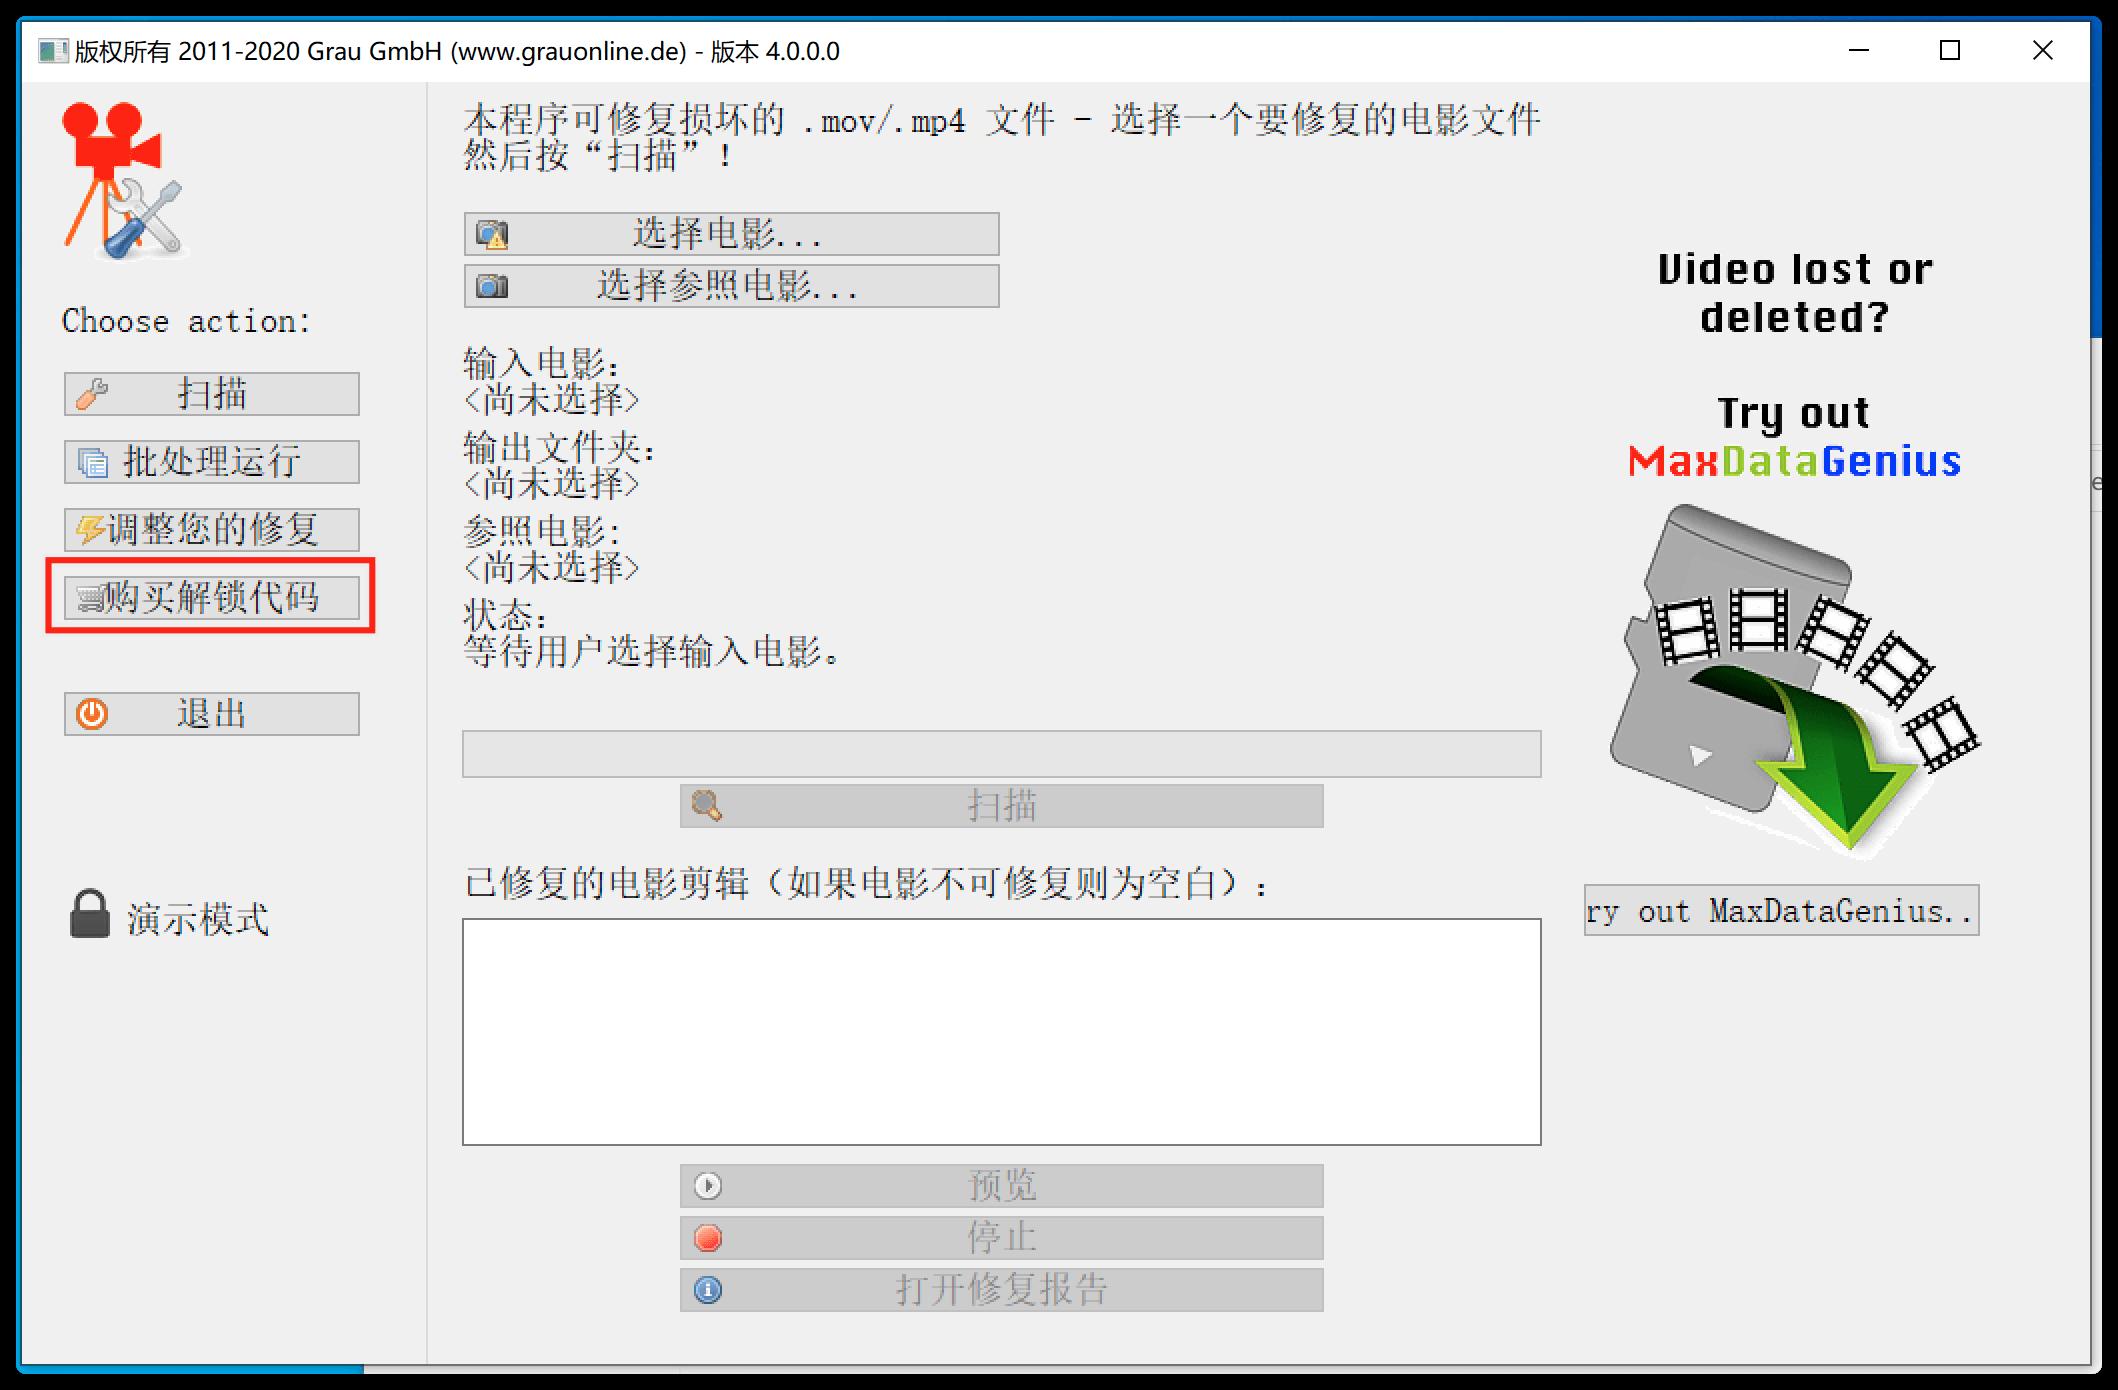 MP4视频文件损坏,可以修复!请看软件Video Repair 4.0.0!插图4